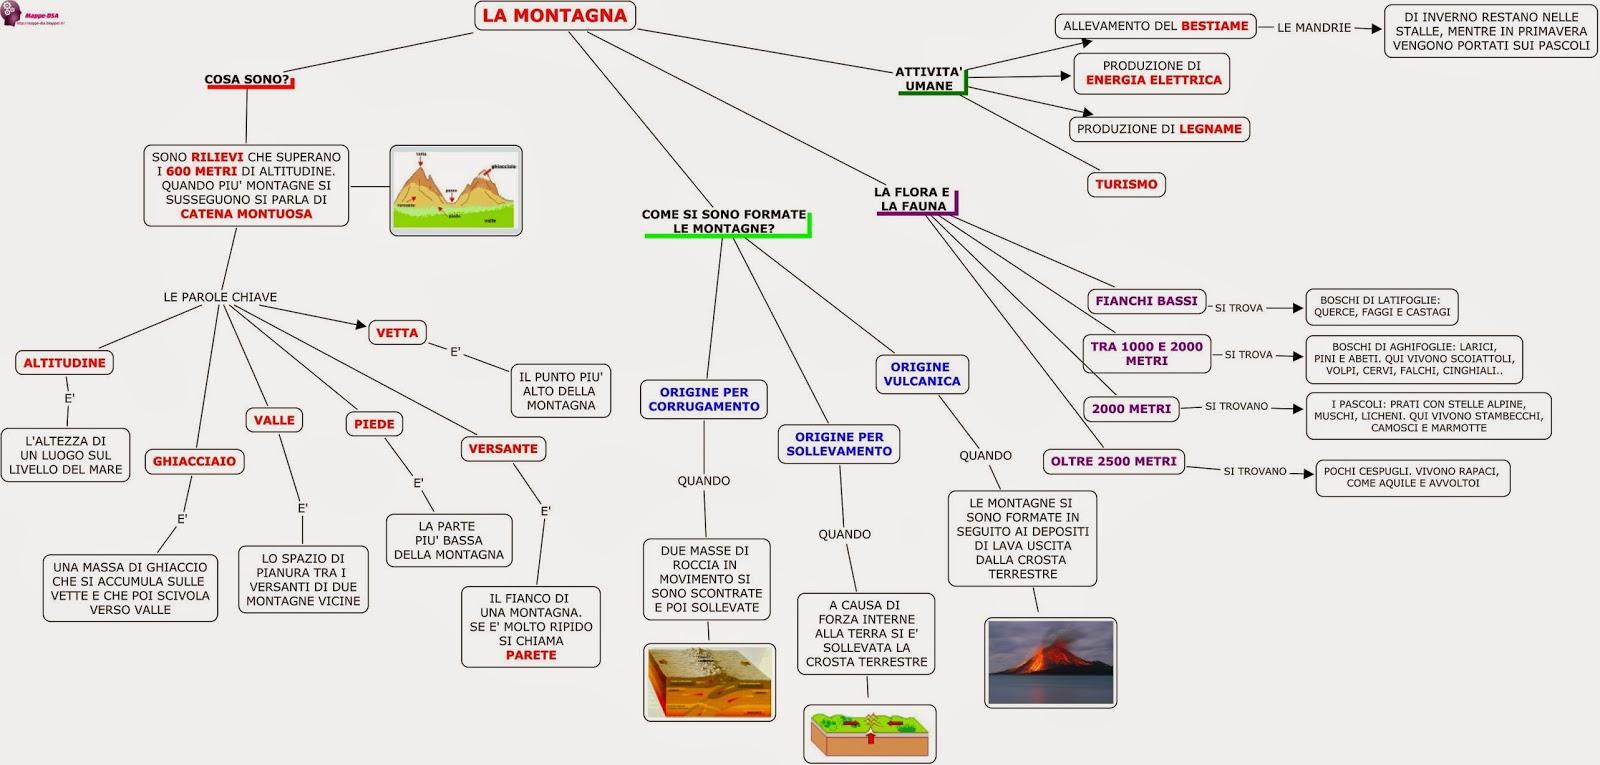 mappa dsa montagna geografia